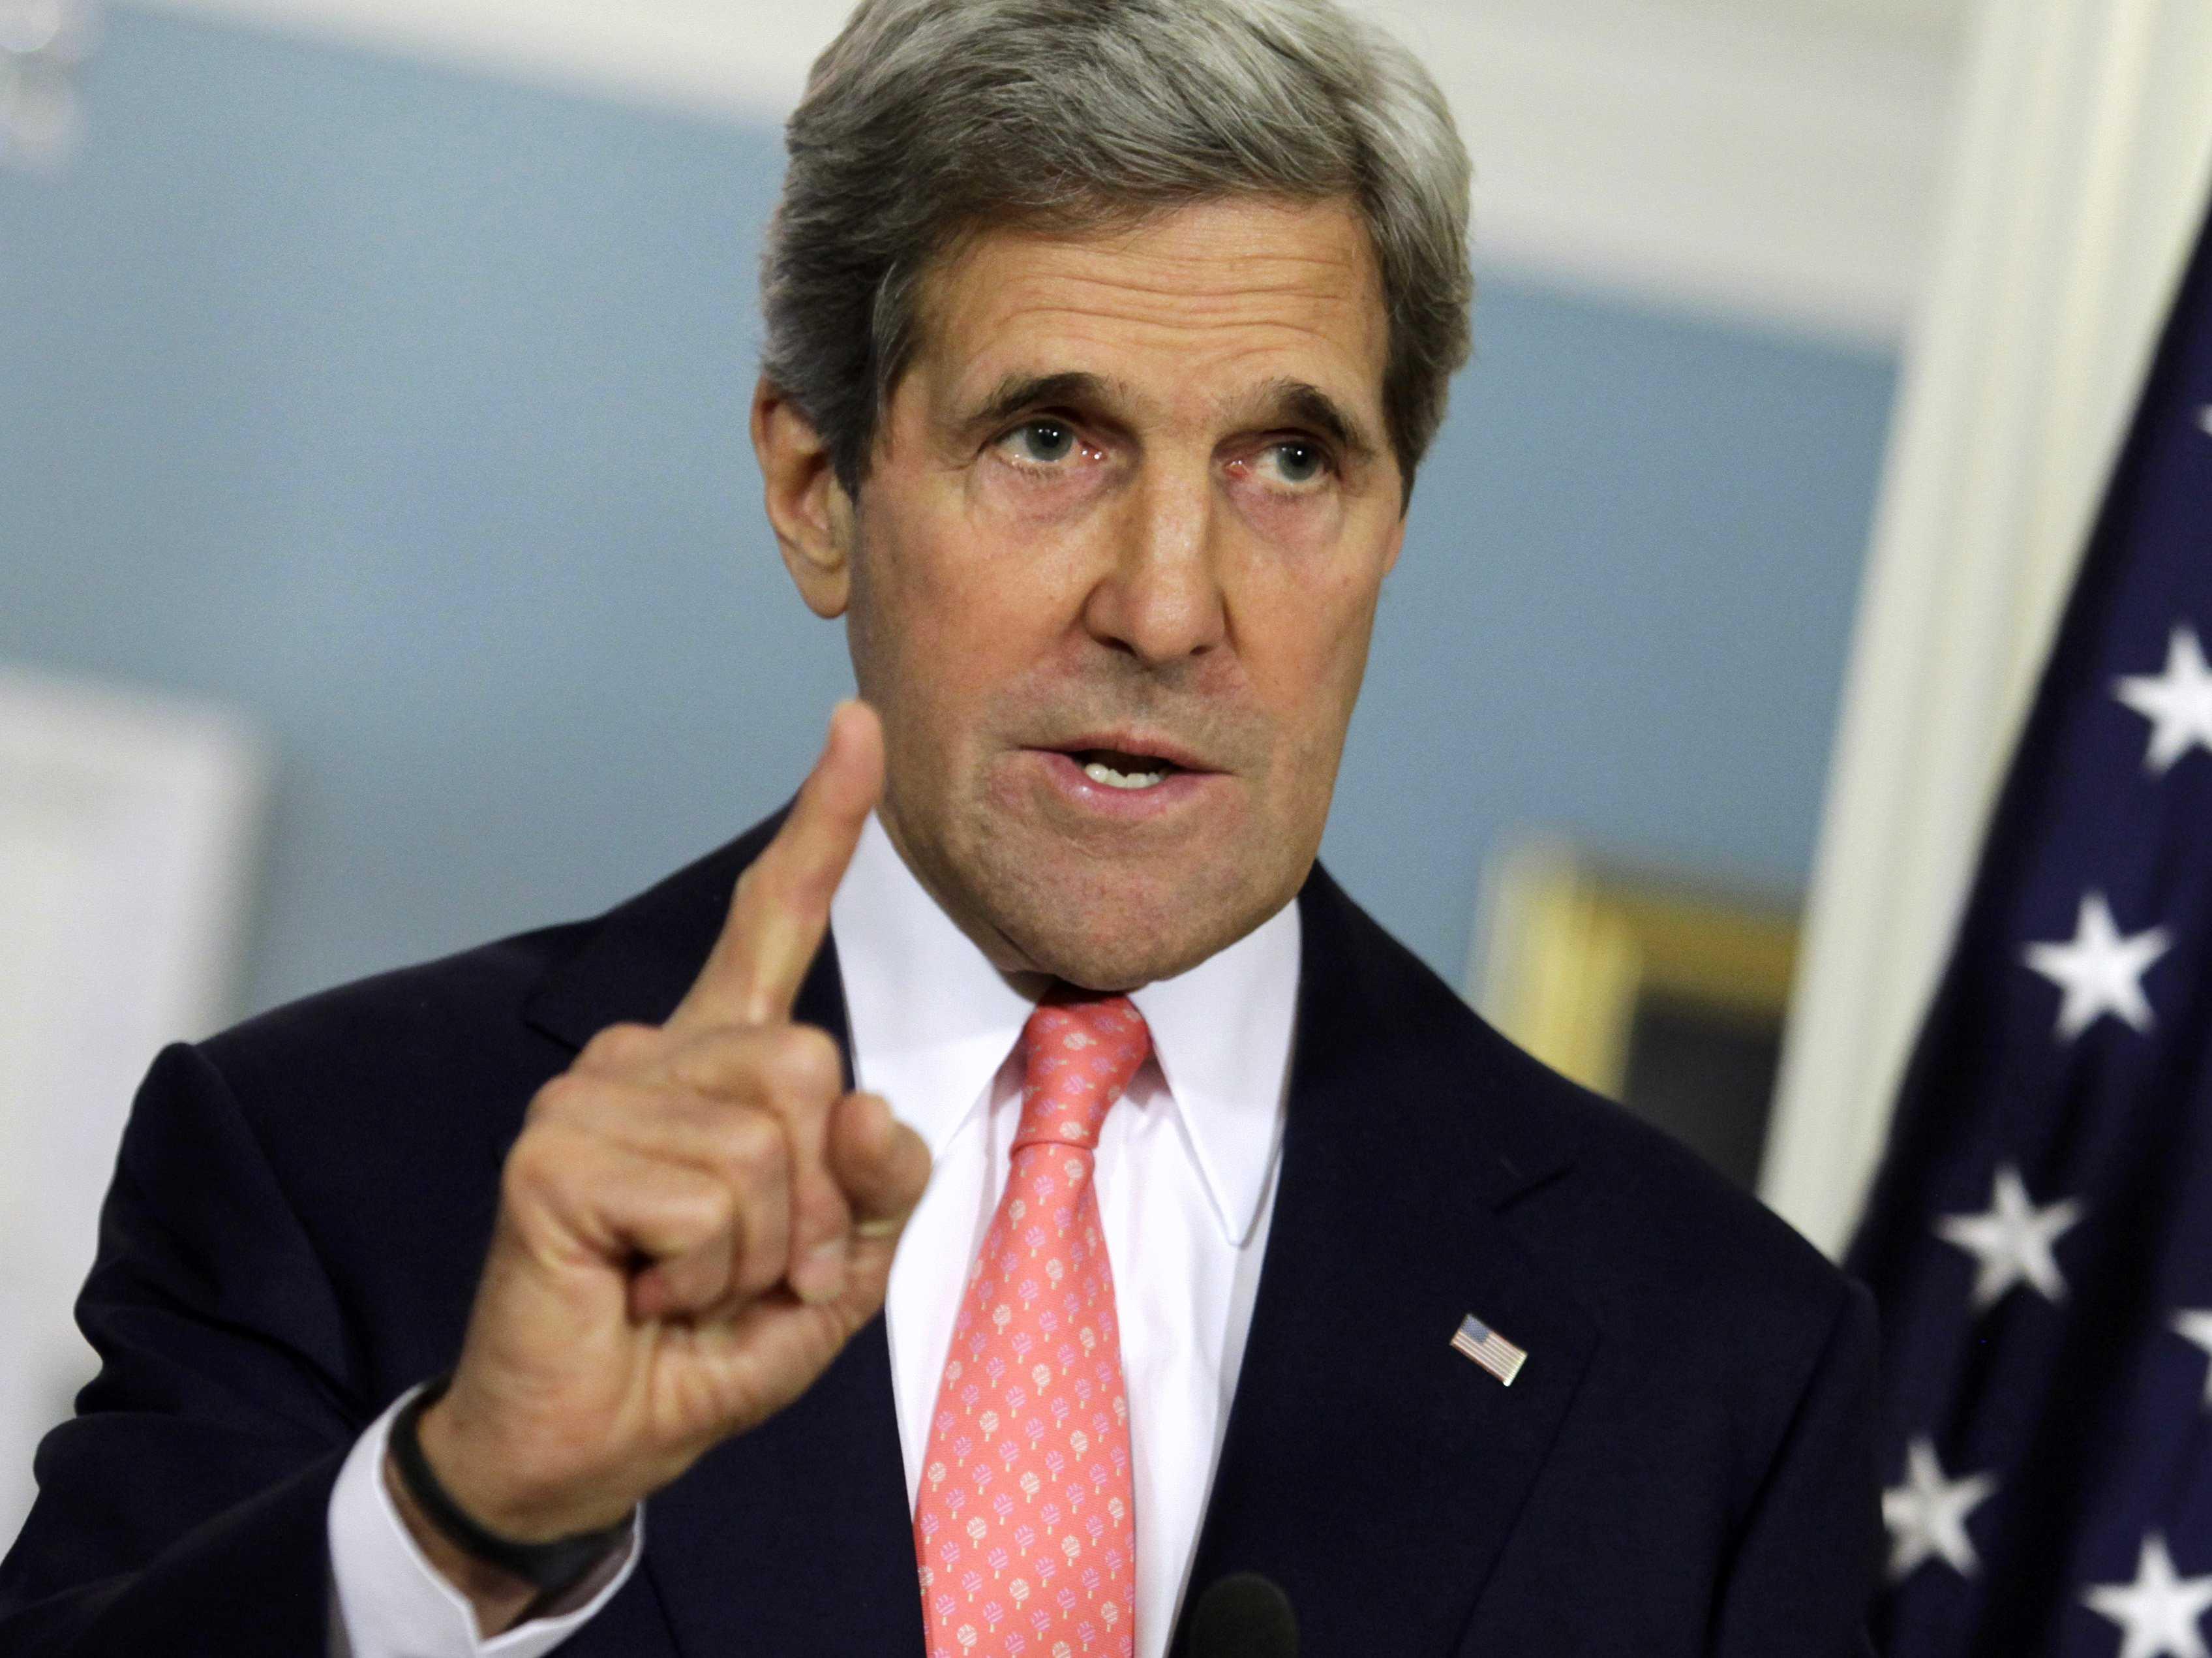 Ukraine Crisis: US Secretary of State Pressures Russia - GEOPOLITICA.info